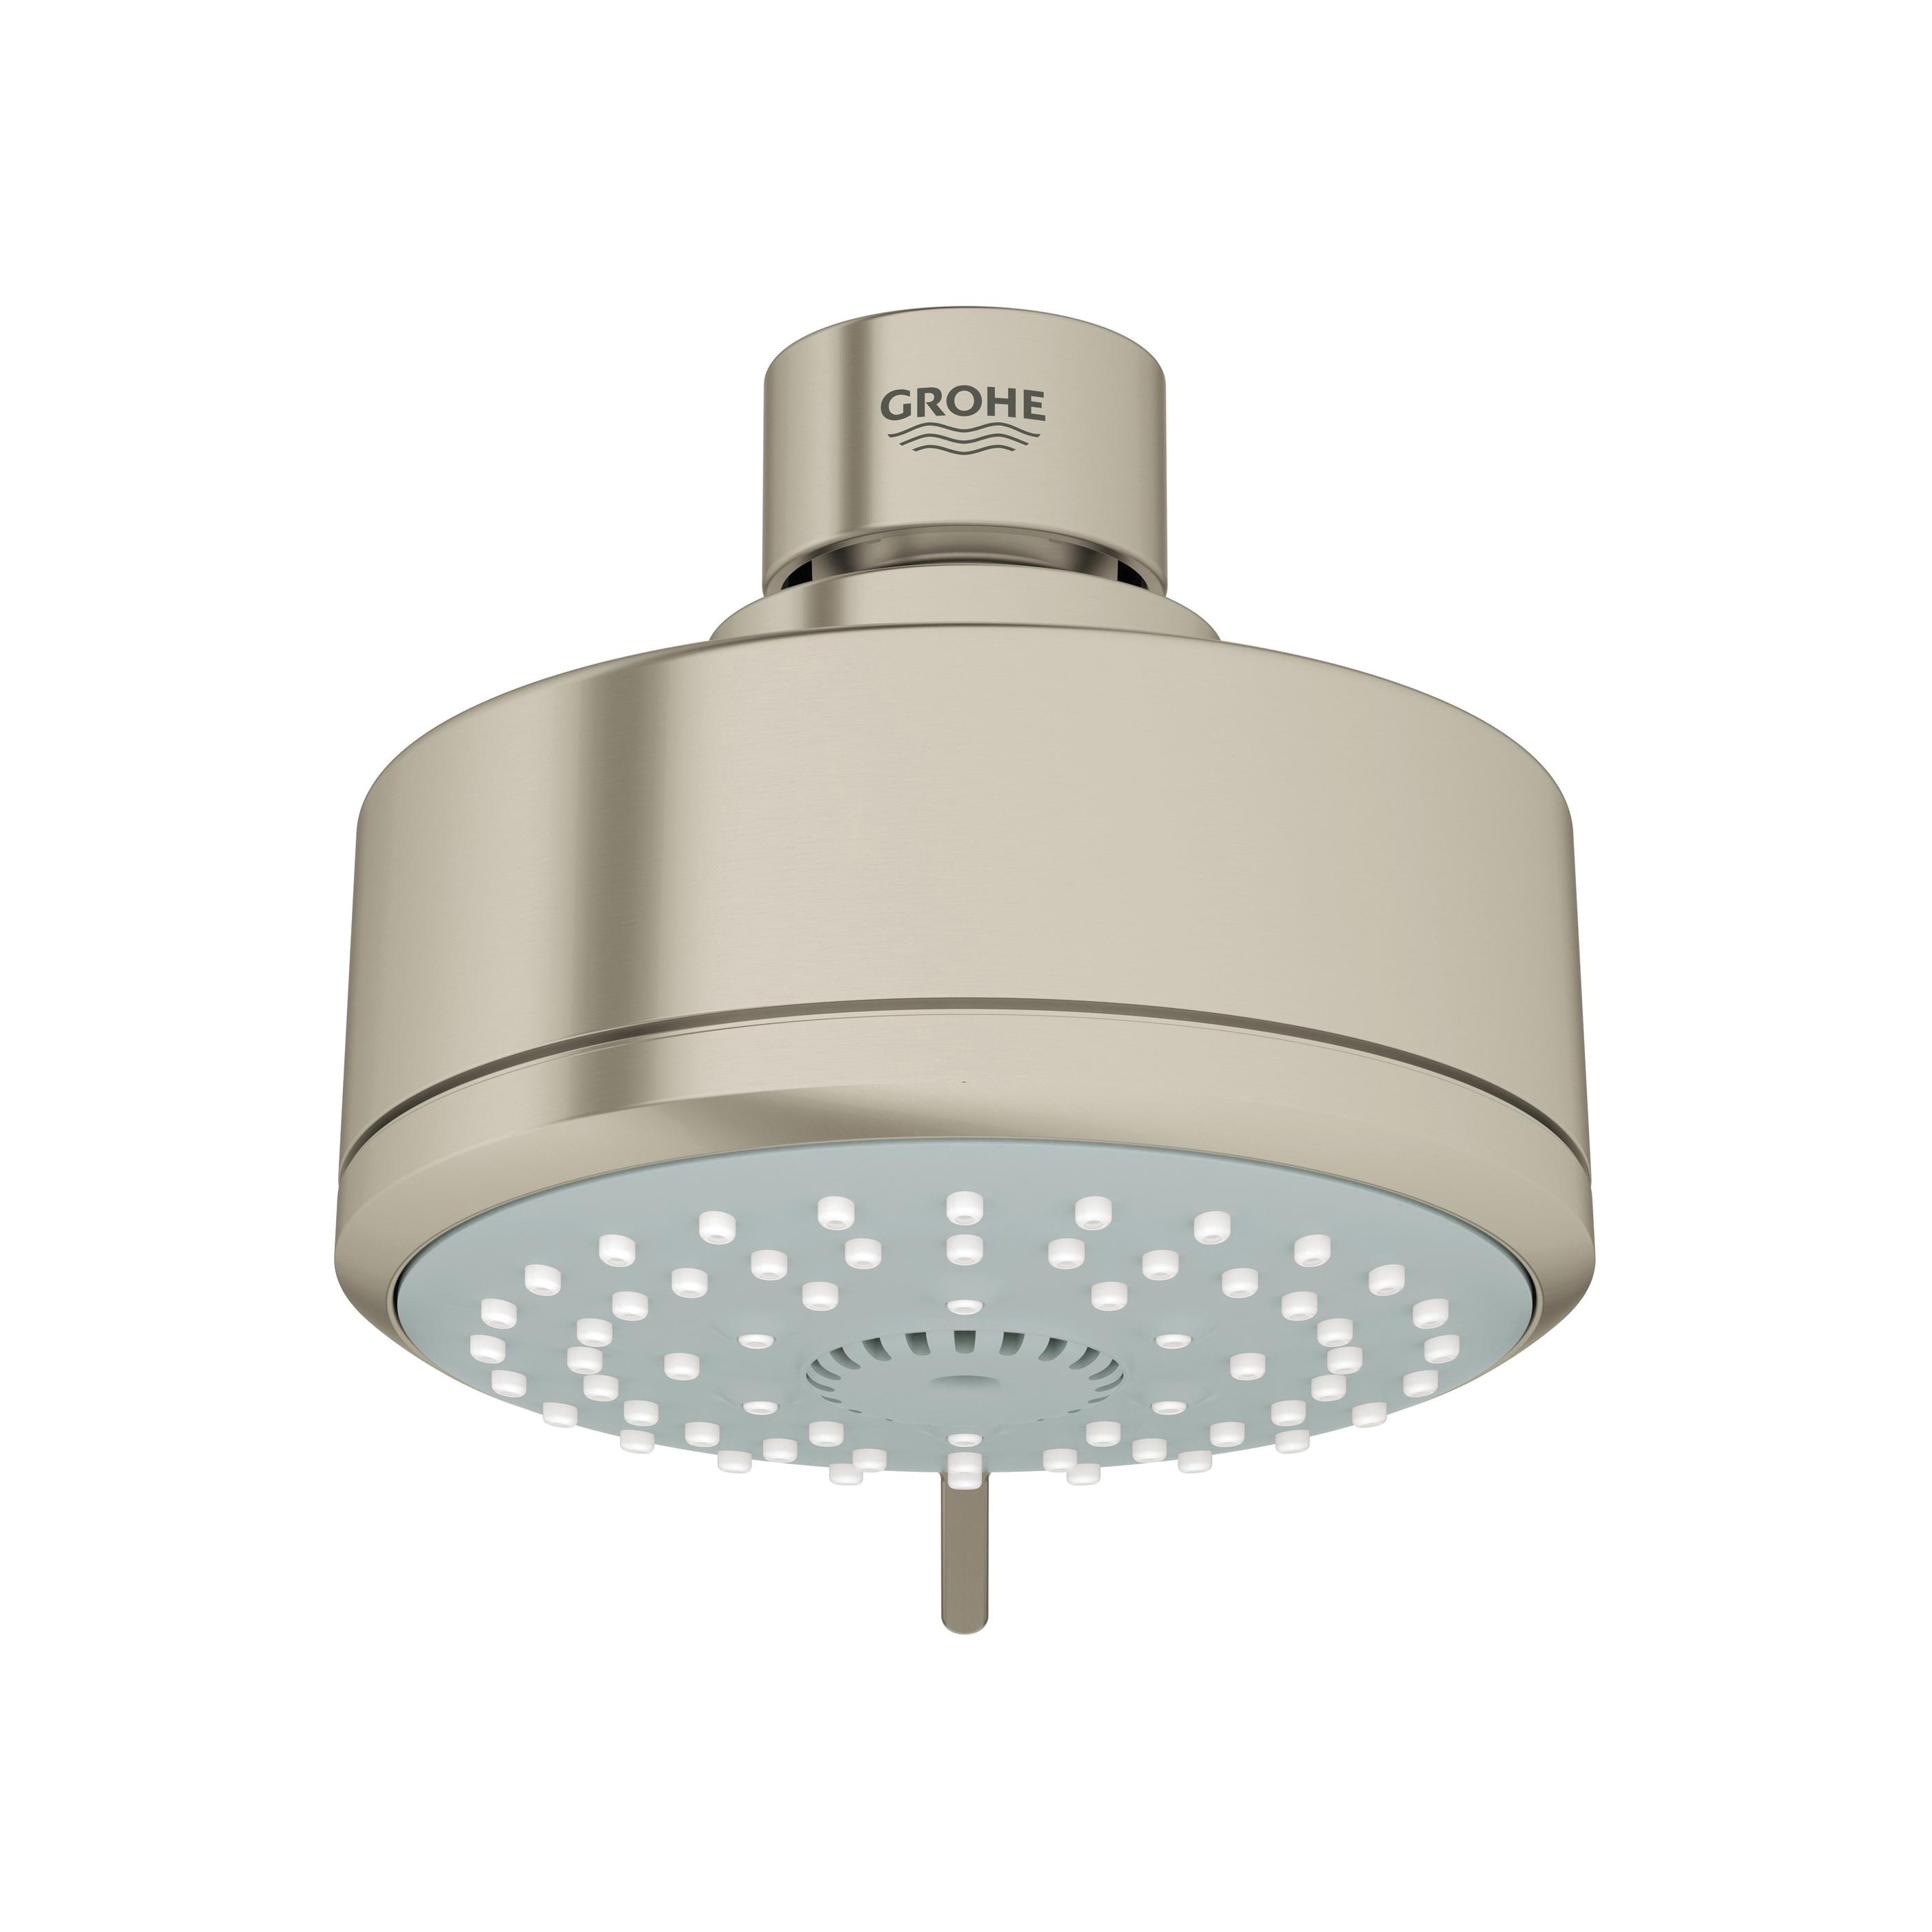 GROHE 27591EN0 New Tempesta® Cosmopolitan 100 Shower Head, 2.5 gpm, 4 Sprays, Wall Mount, 3-15/16 in Dia Head, Import